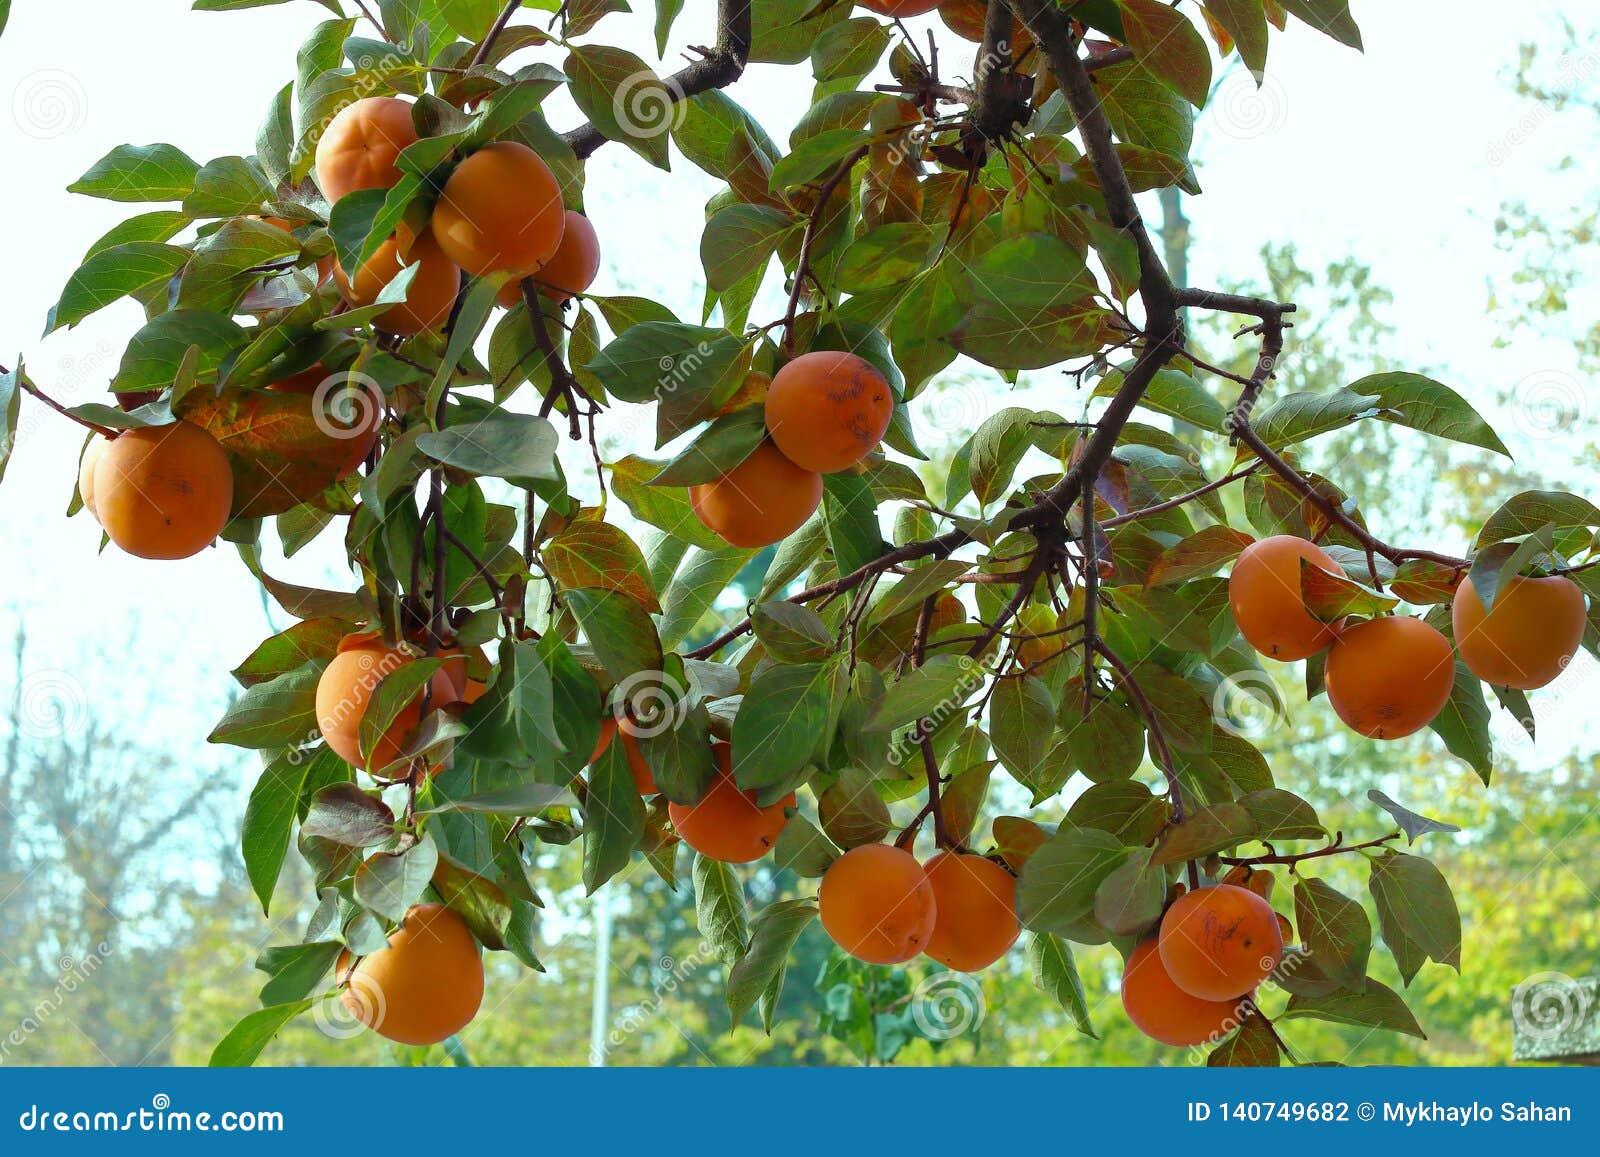 Persimmon tree with Ripe orange fruits in the autumn garden